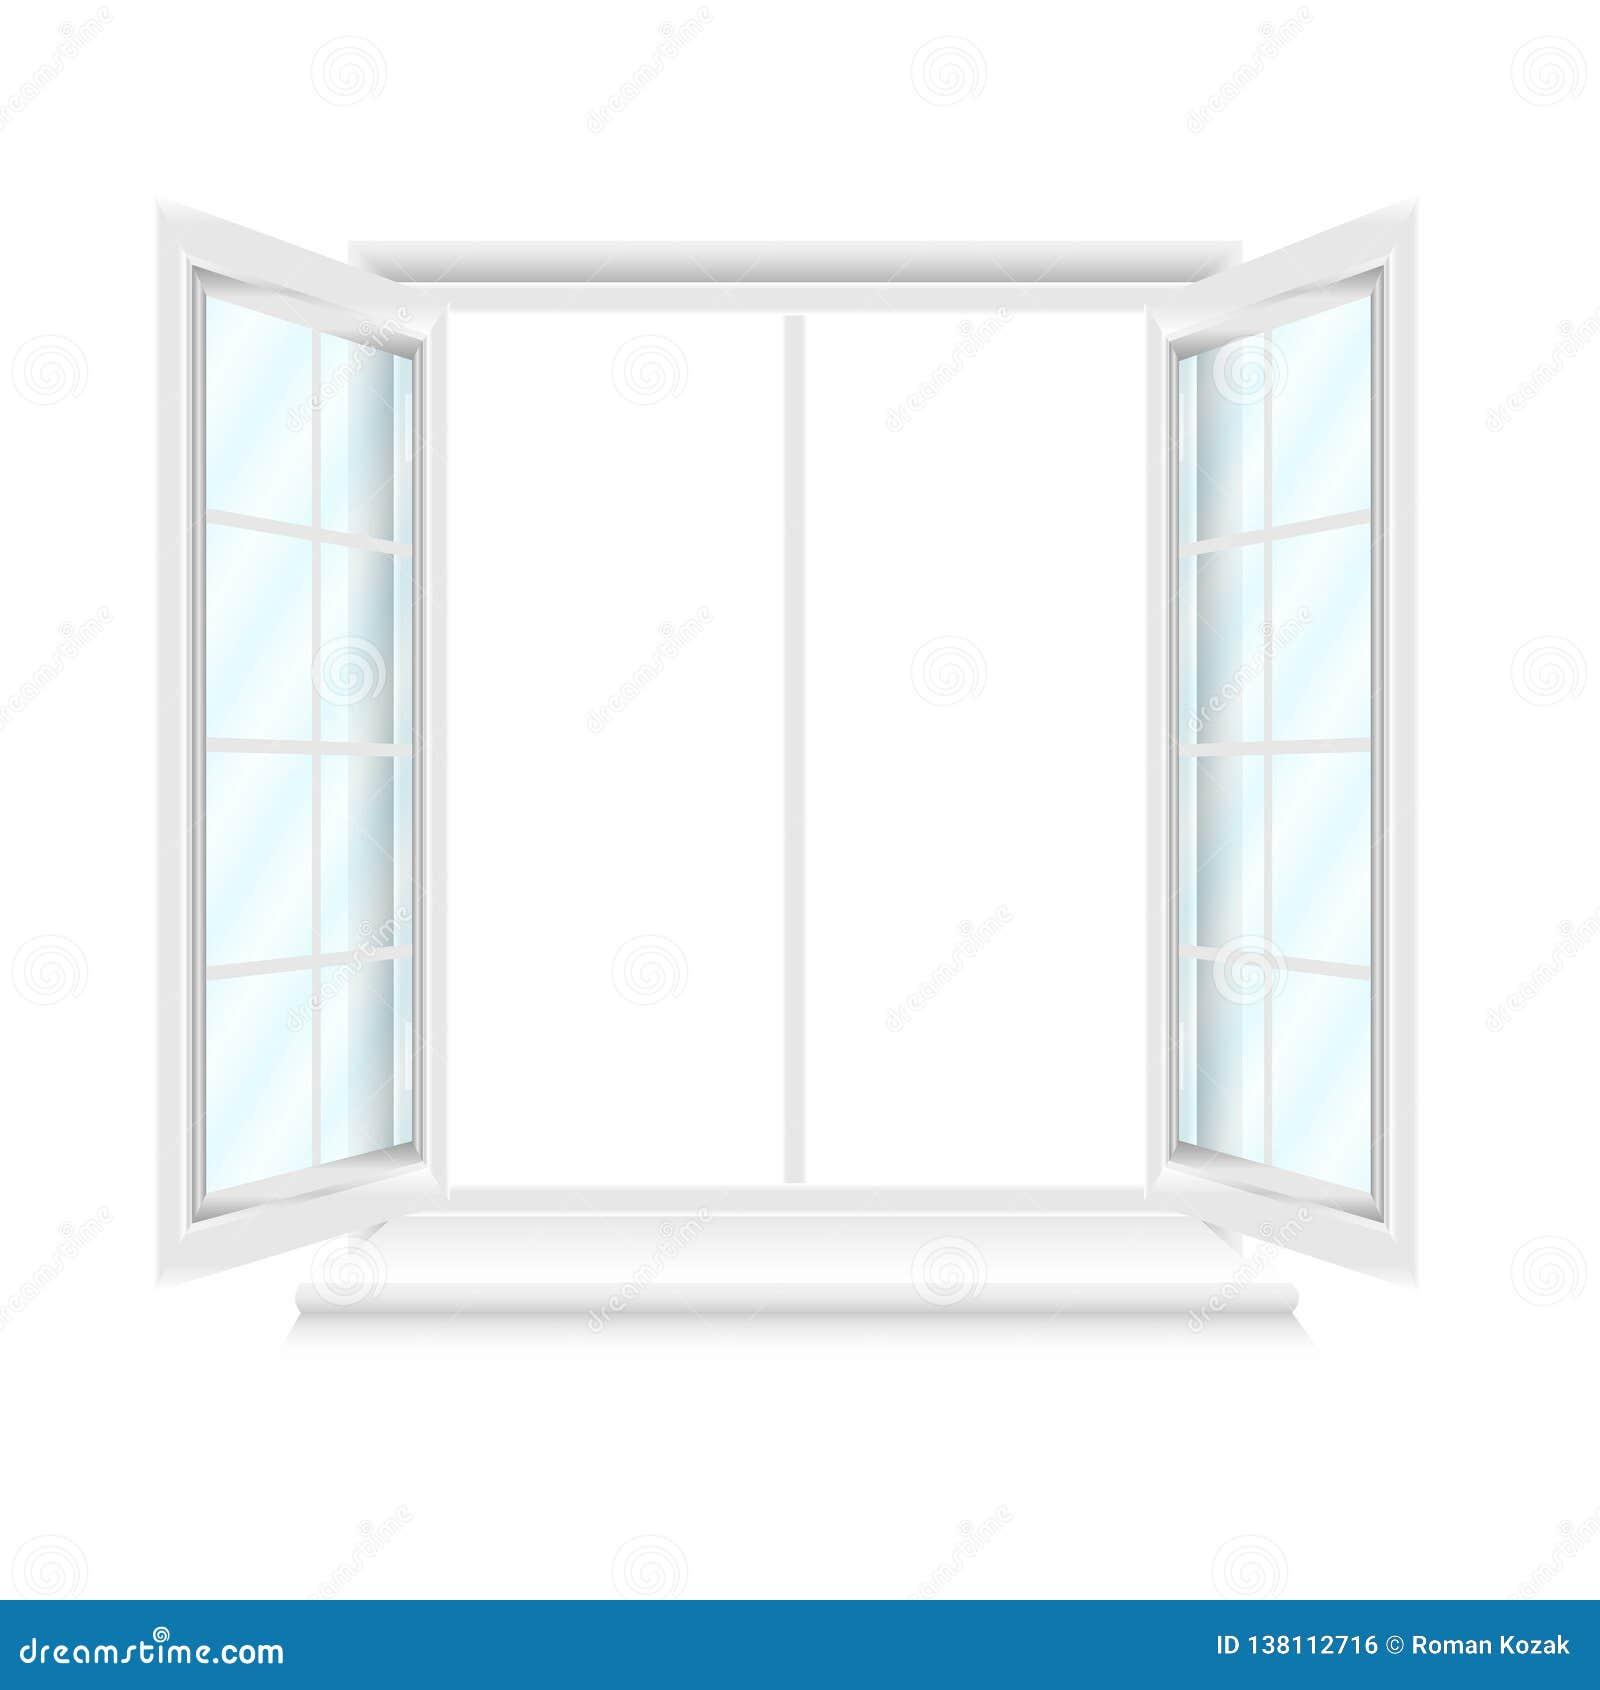 Janela branca aberta com vidros azuis no fundo branco